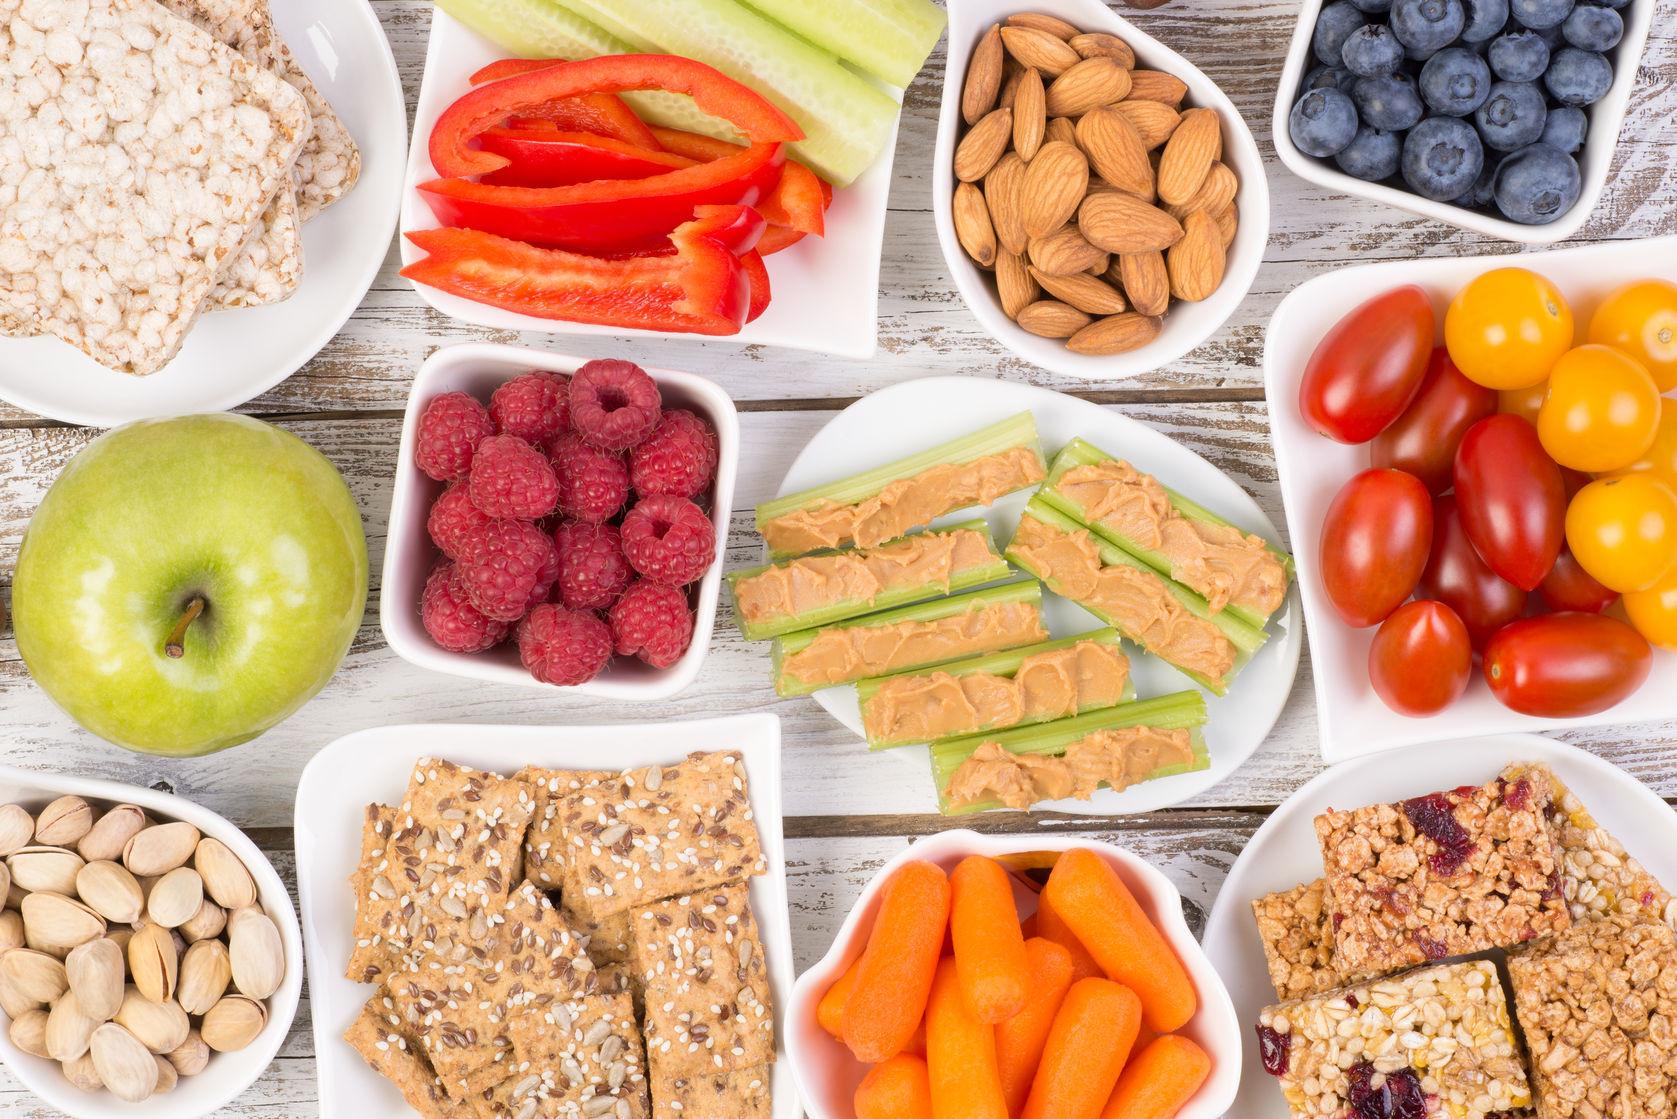 Best Healthy Snacks  5 Healthy Snack Ideas That Require NO Skills